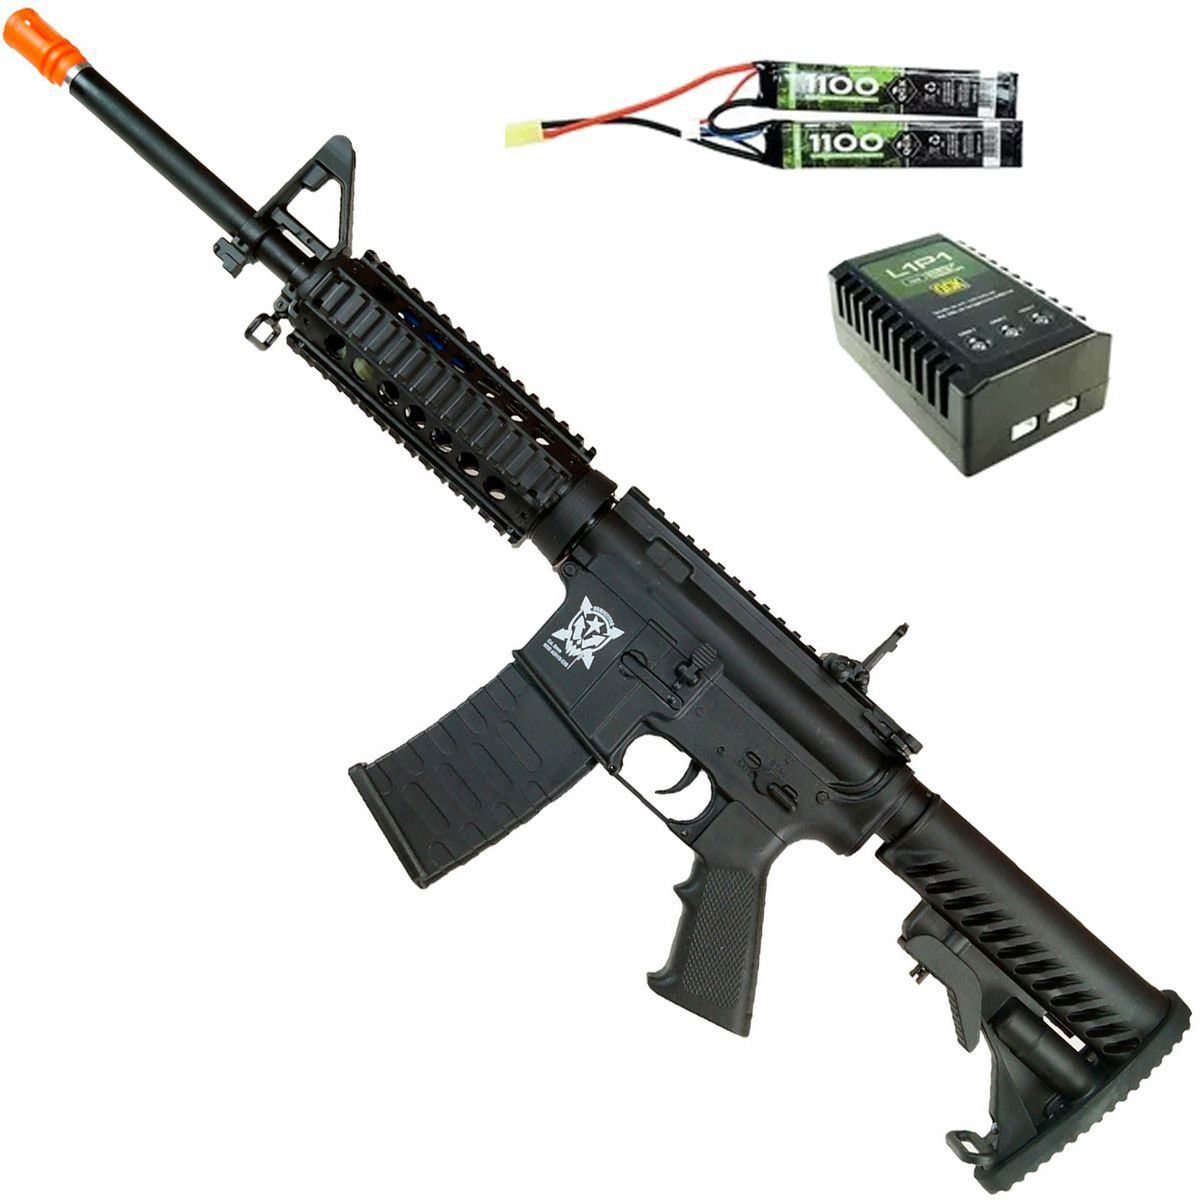 Rifle Airsoft APS M4 Kompetitor Blowback Elétrico Bivolt 6mm